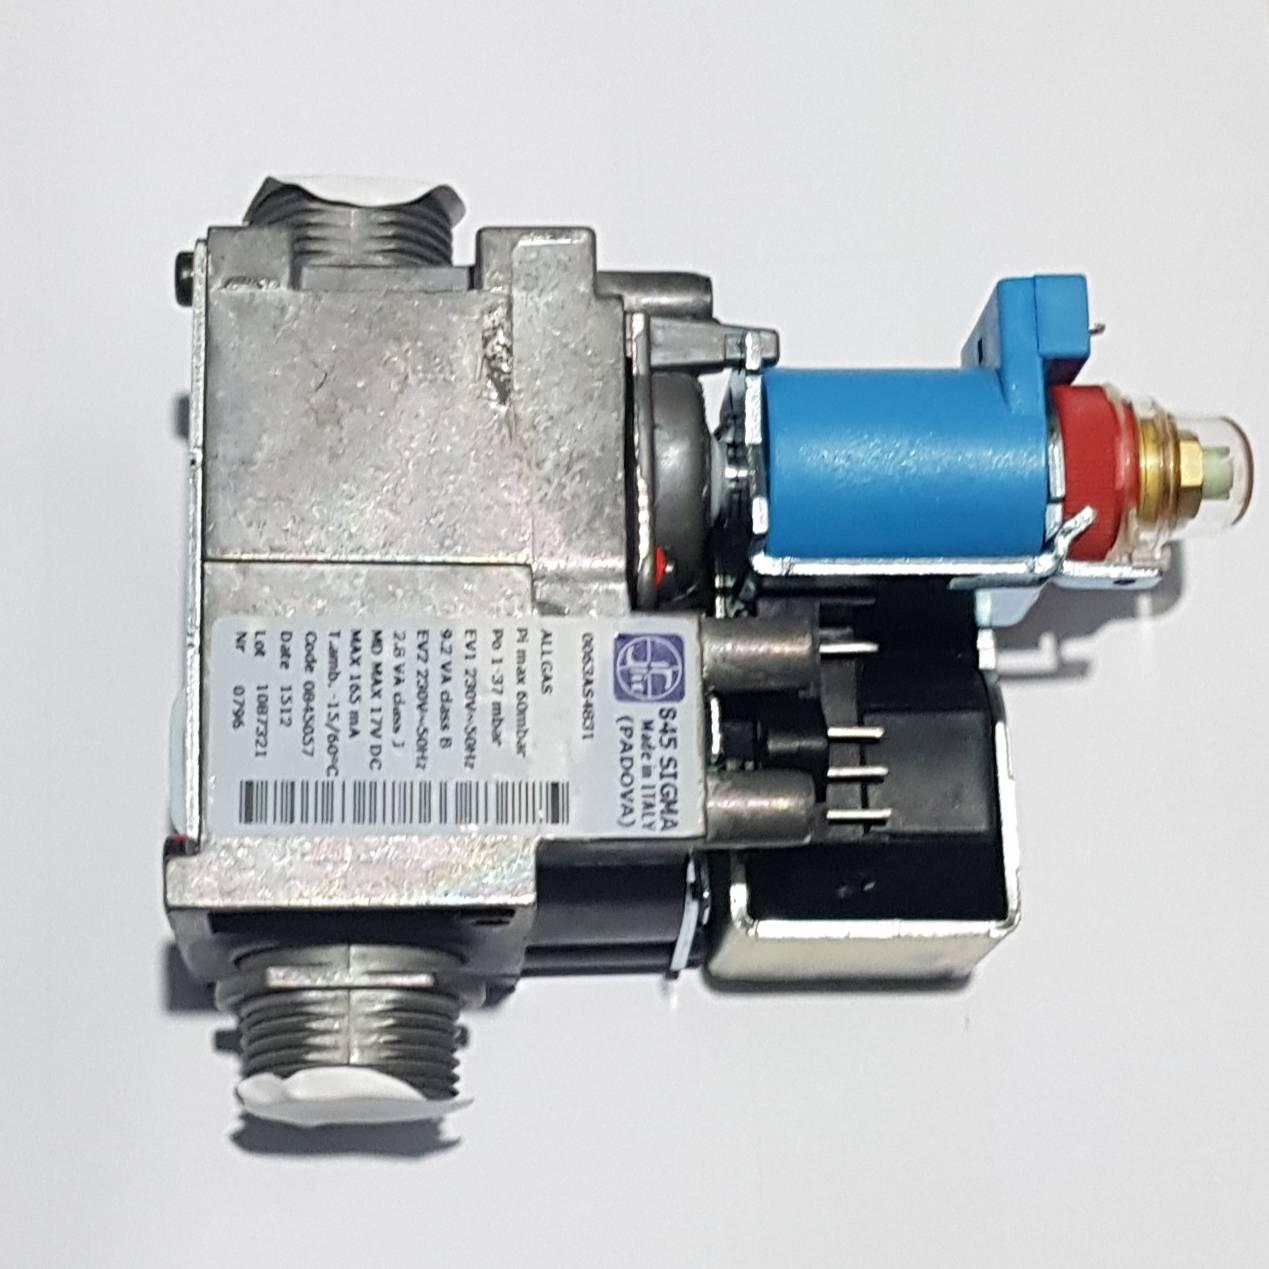 Sime valvula gas sit 845 sigma zip format 4,  - Foto 1